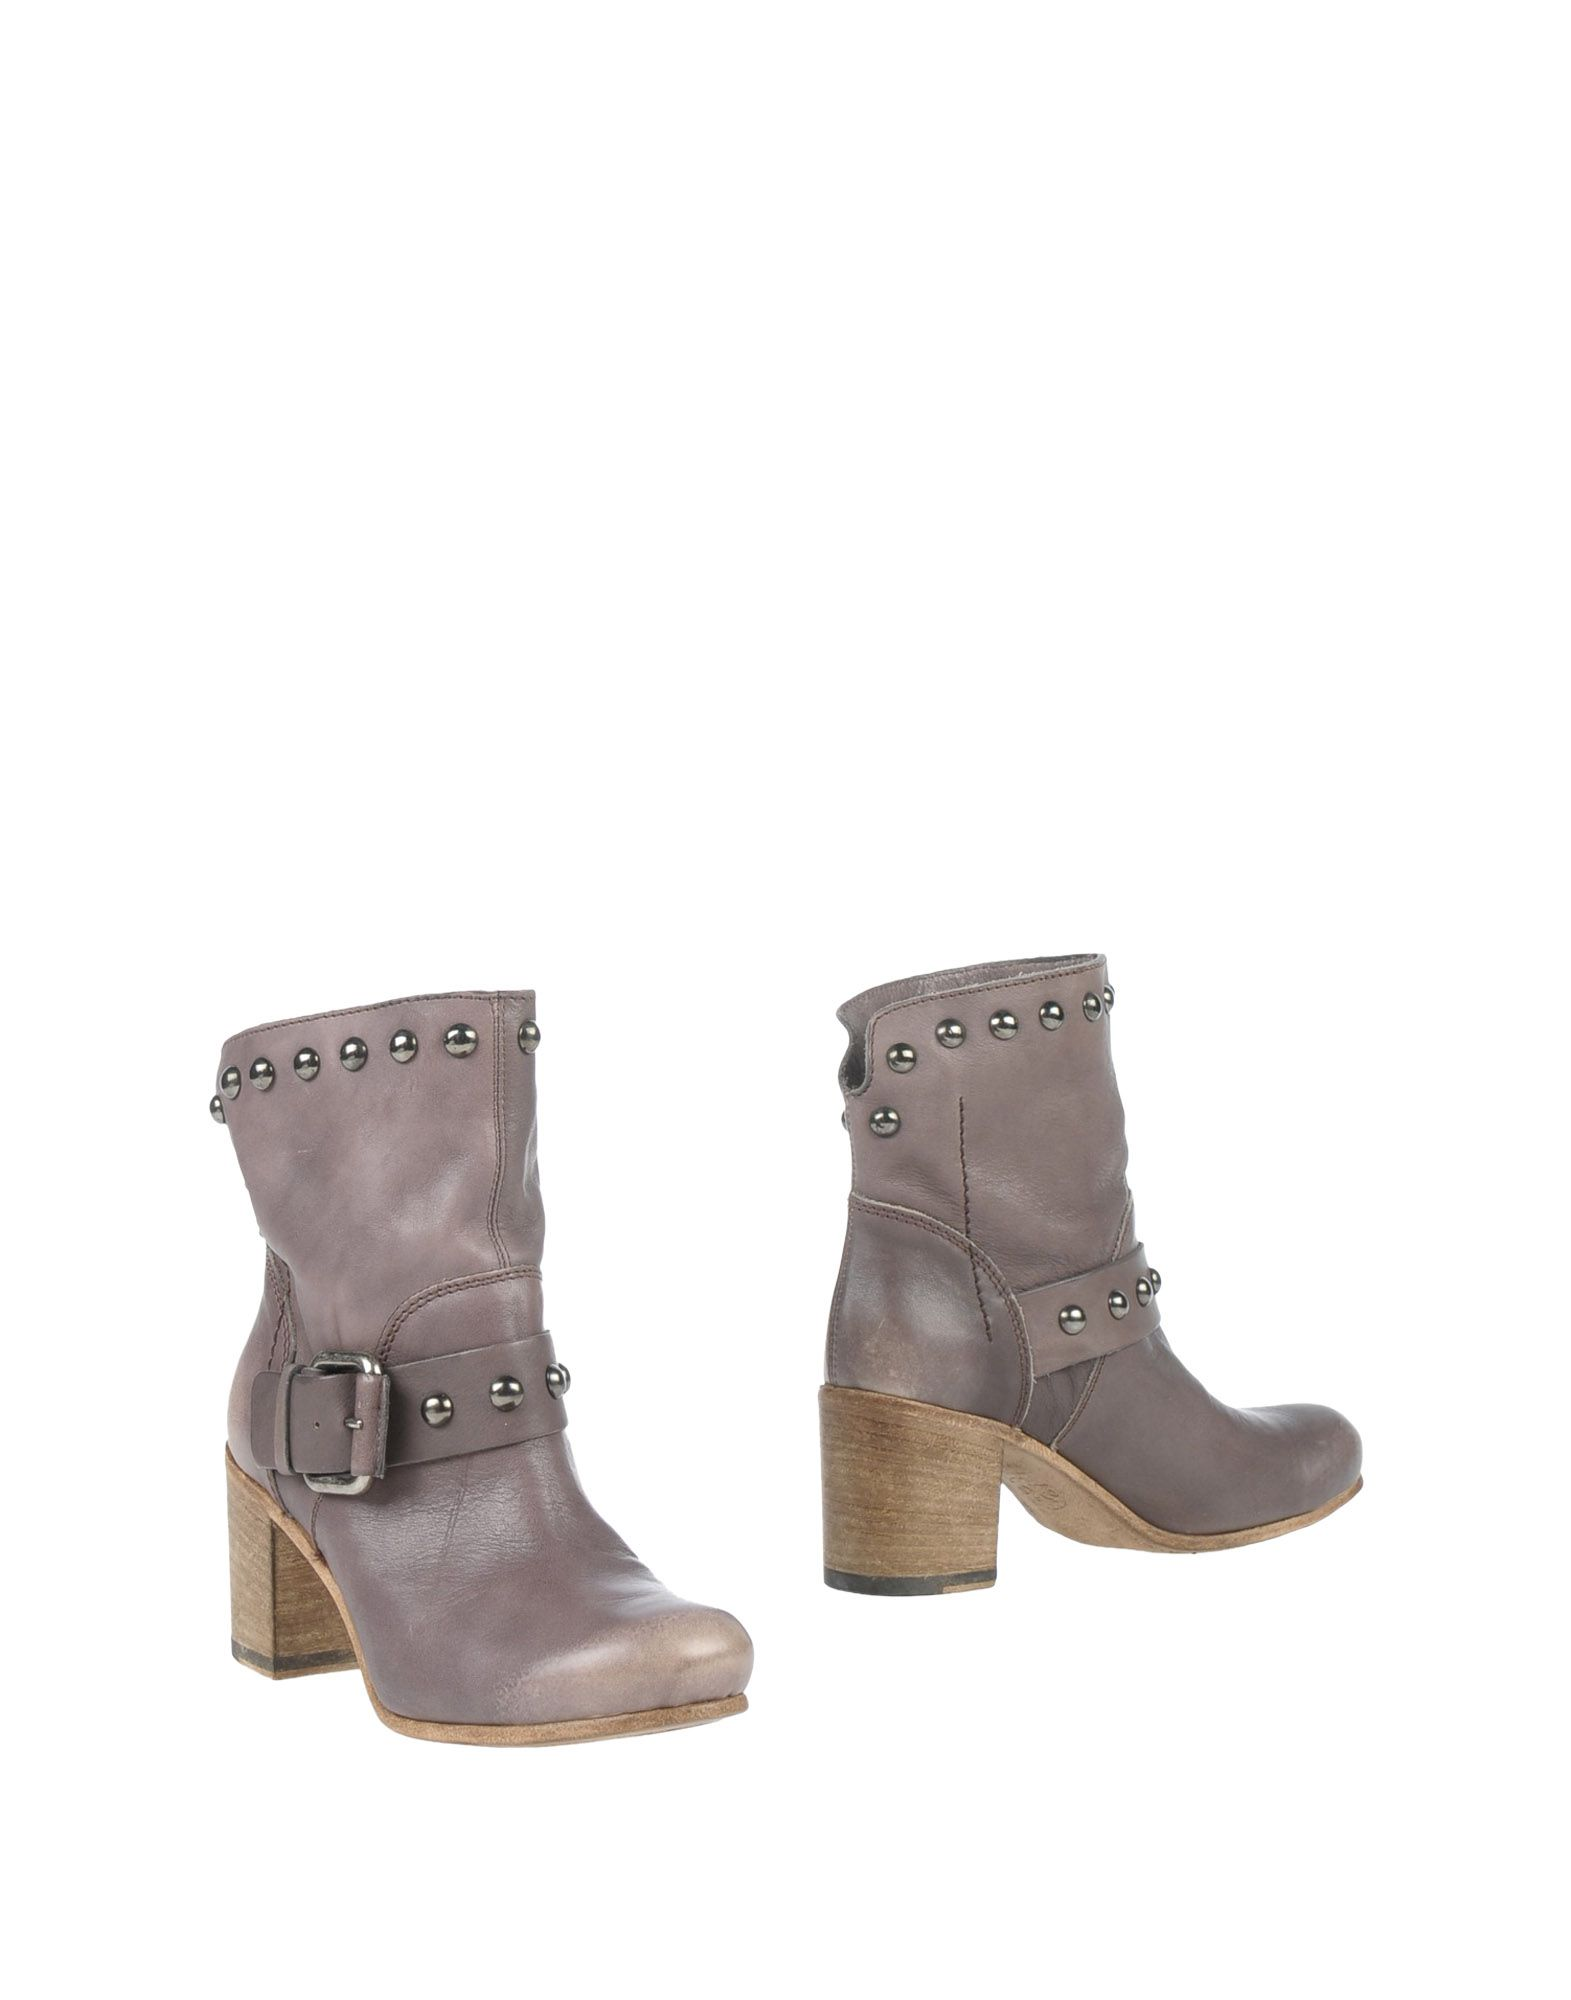 Moda Stivaletti O.X.S. Donna - 11403005MQ